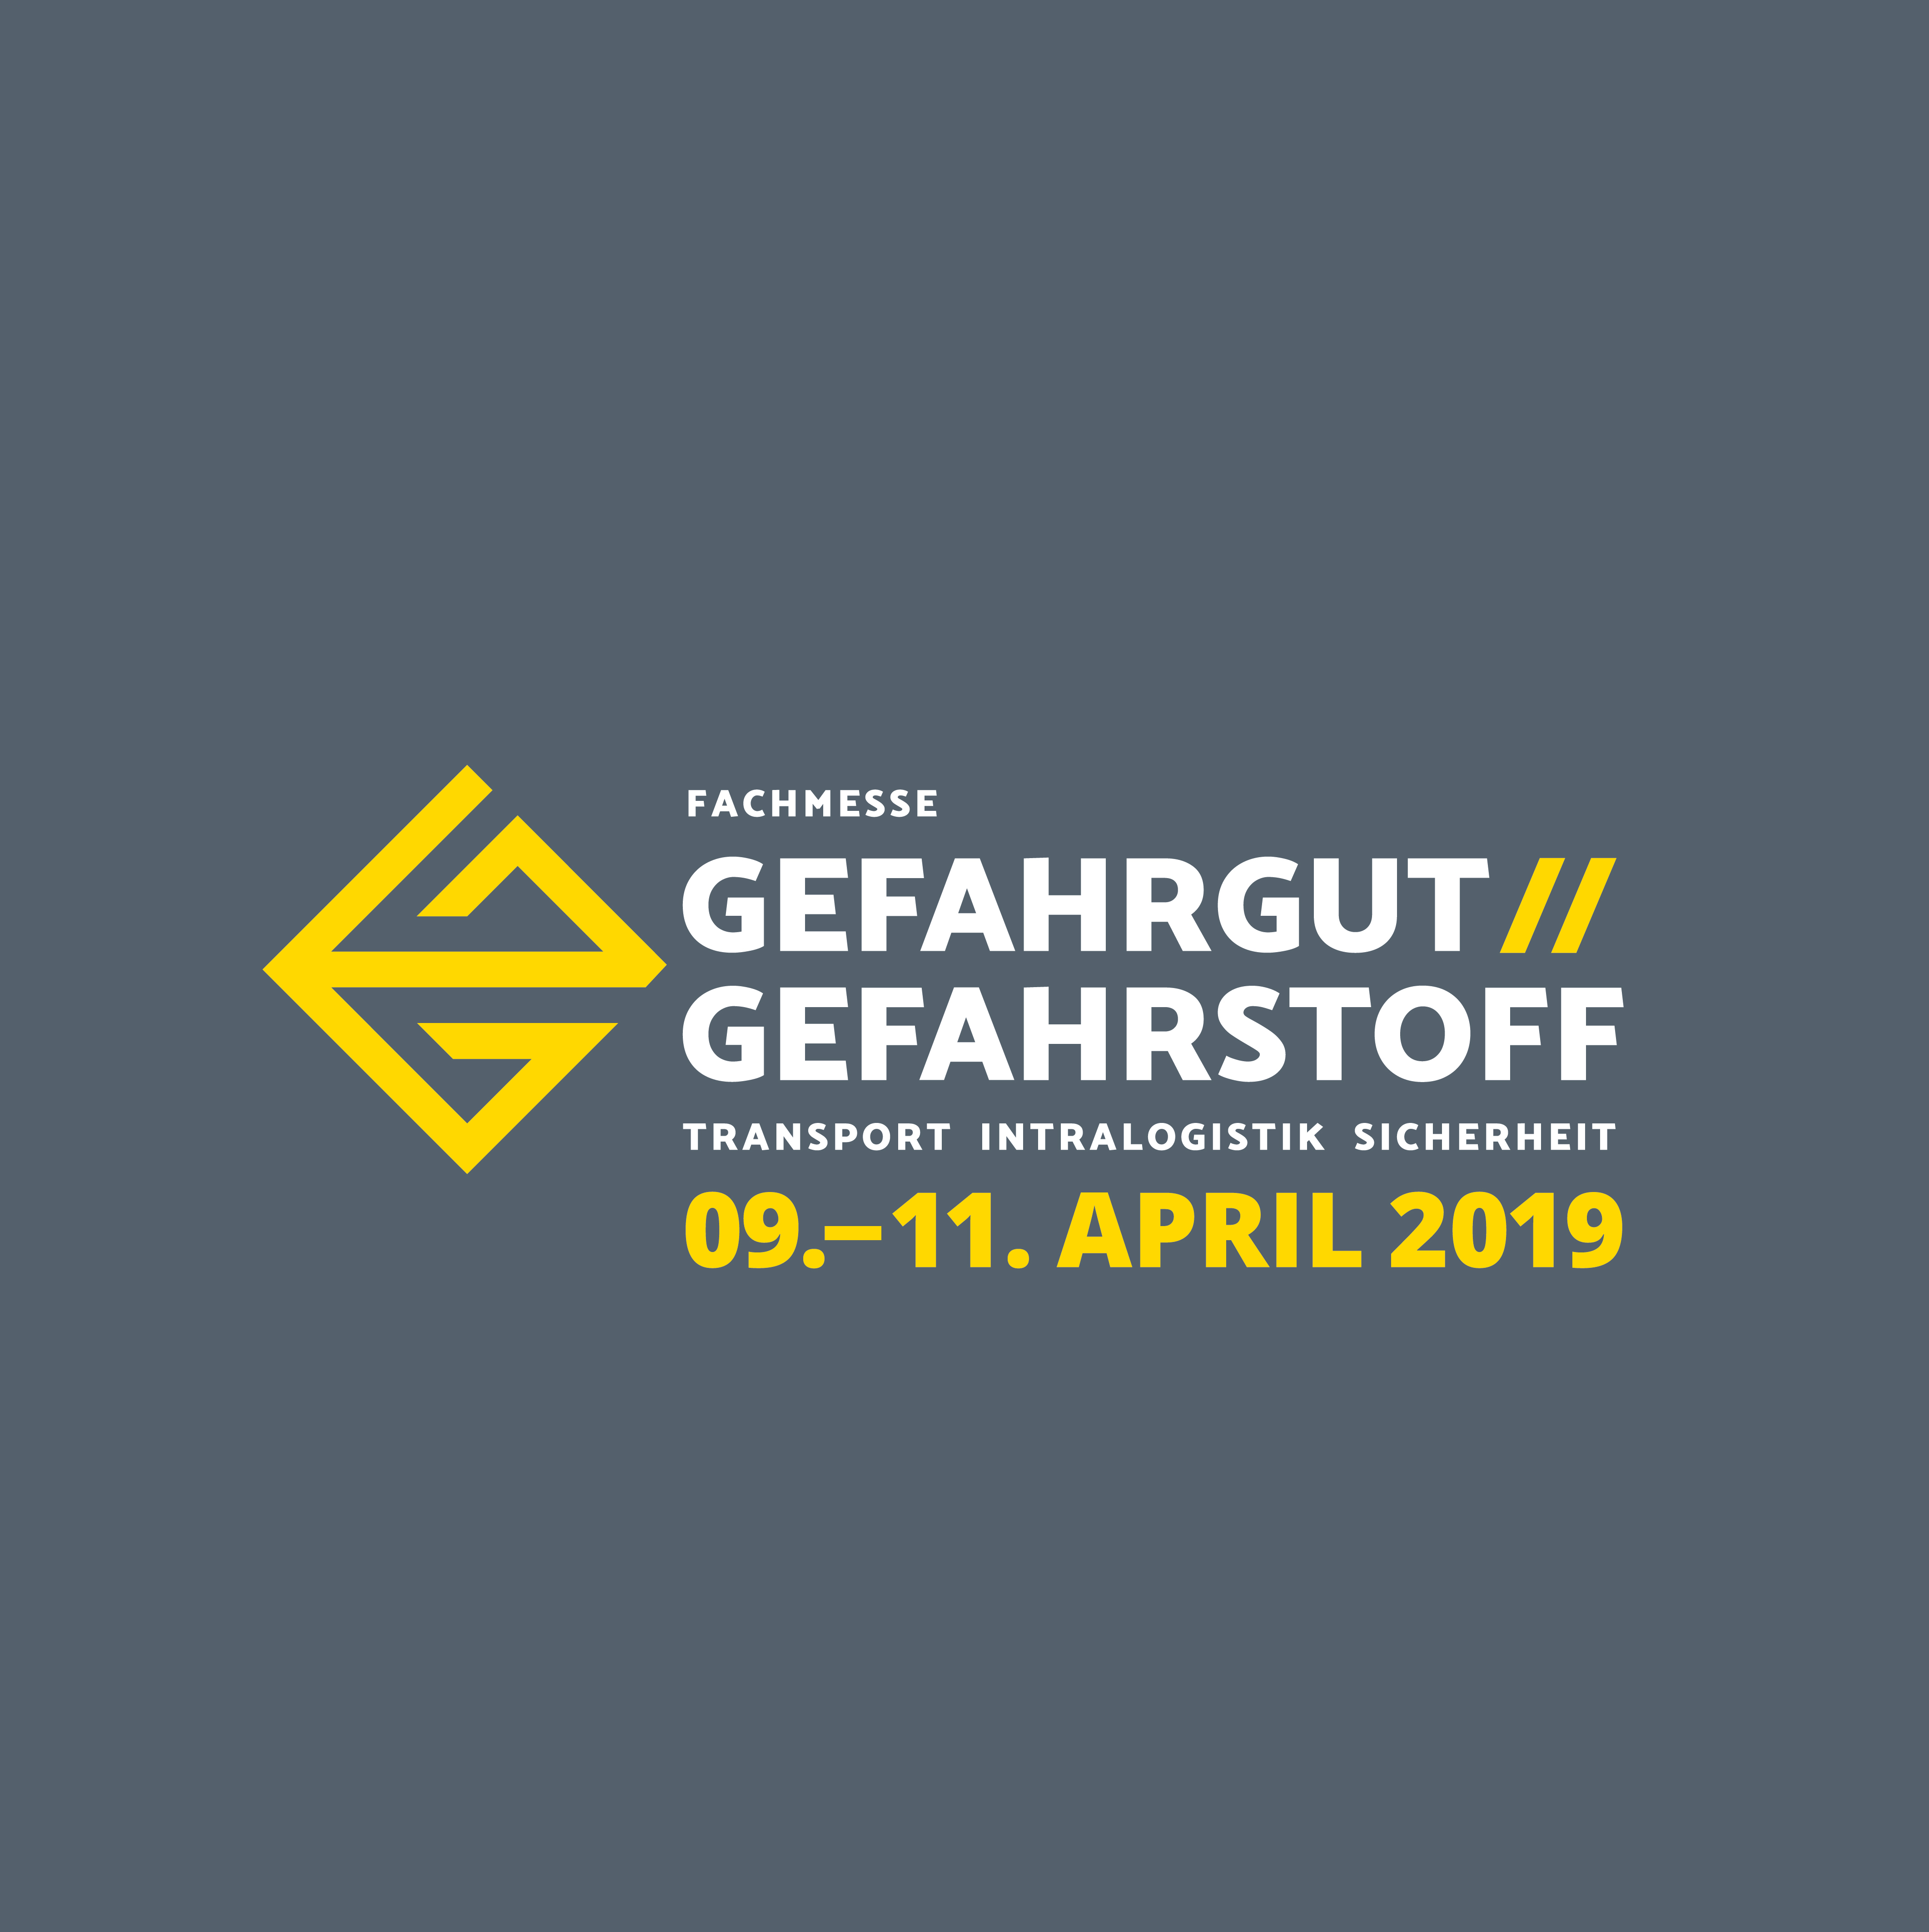 Fachmesse Gefahrgut // Gefahrstoff 2019 - 09. April bis 11. April in Leipzig